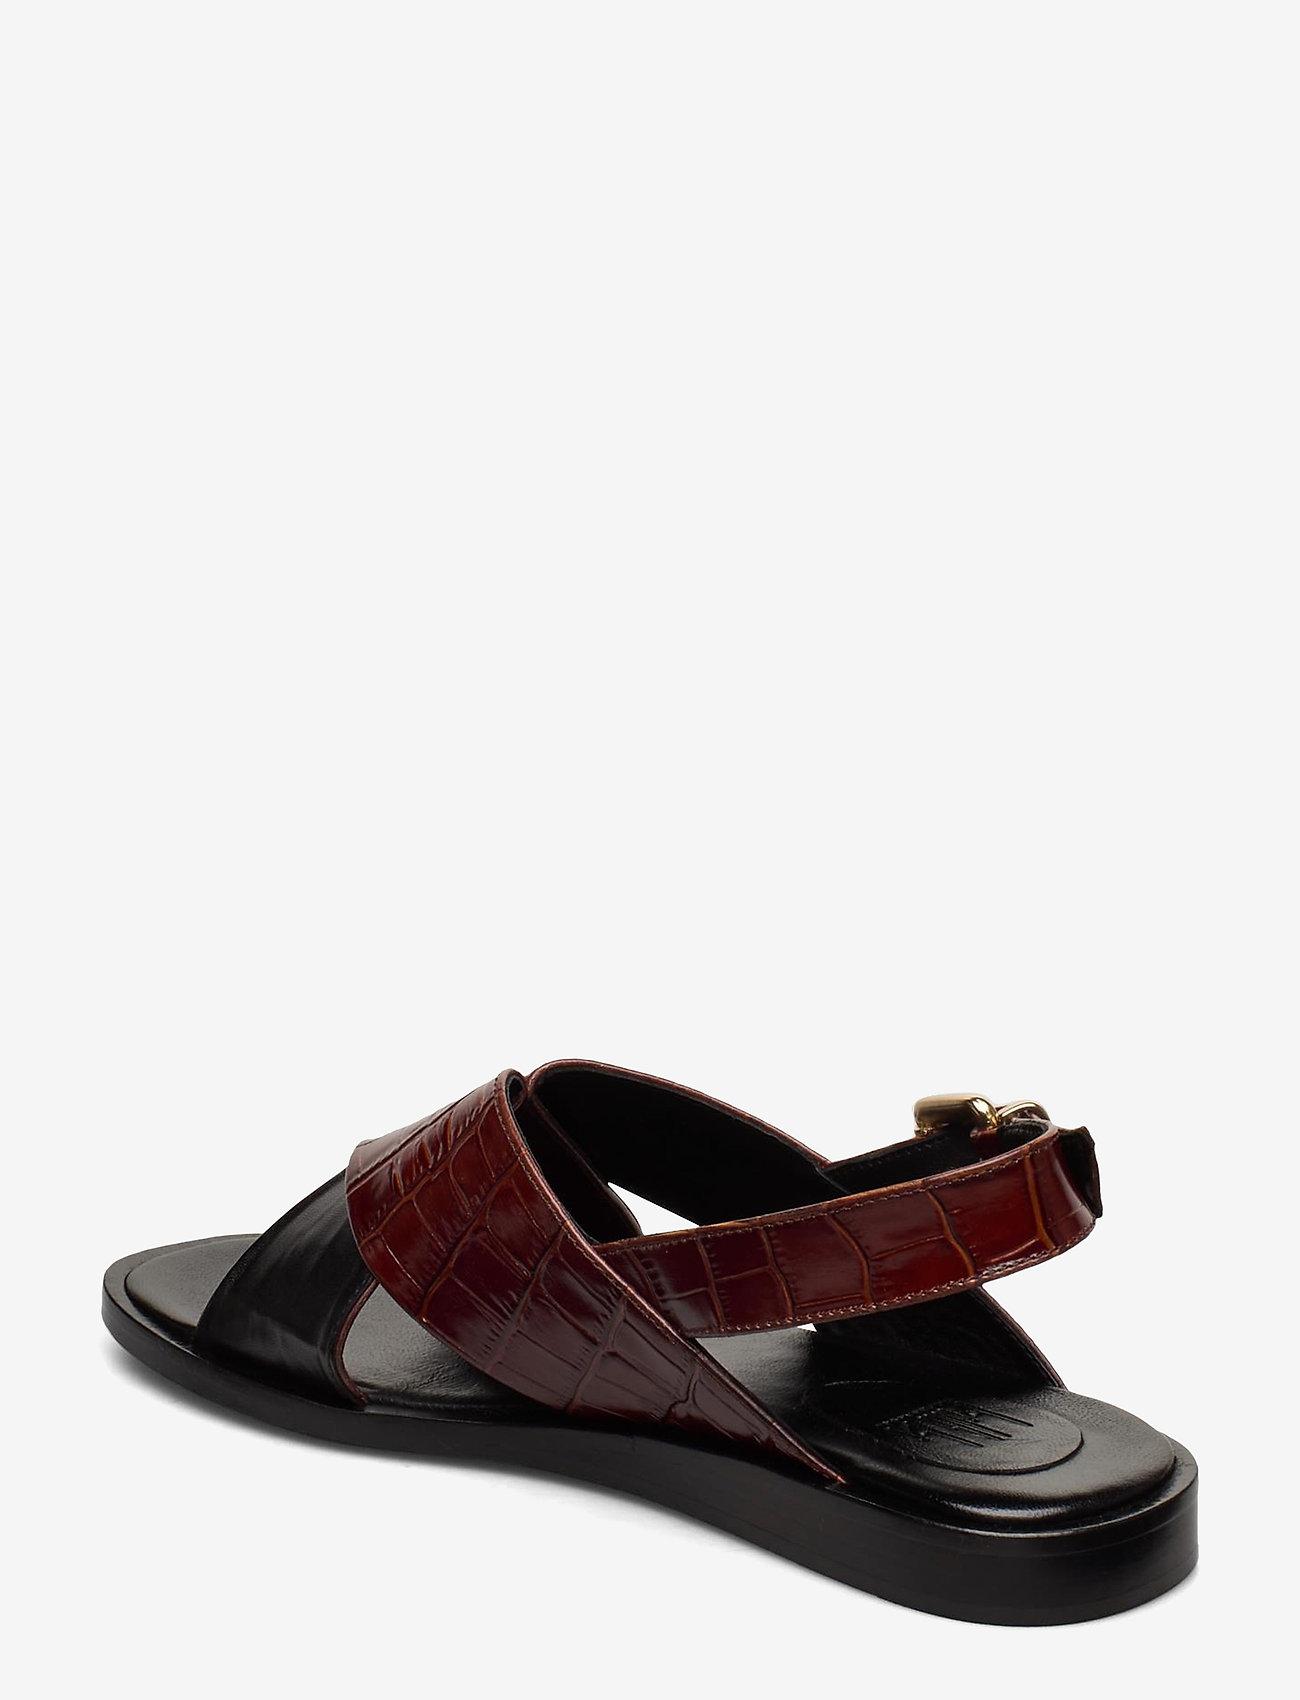 Slipper 4176 (Black Calf/brandy Monterey 825) (118.30 €) - Billi Bi oWhfh